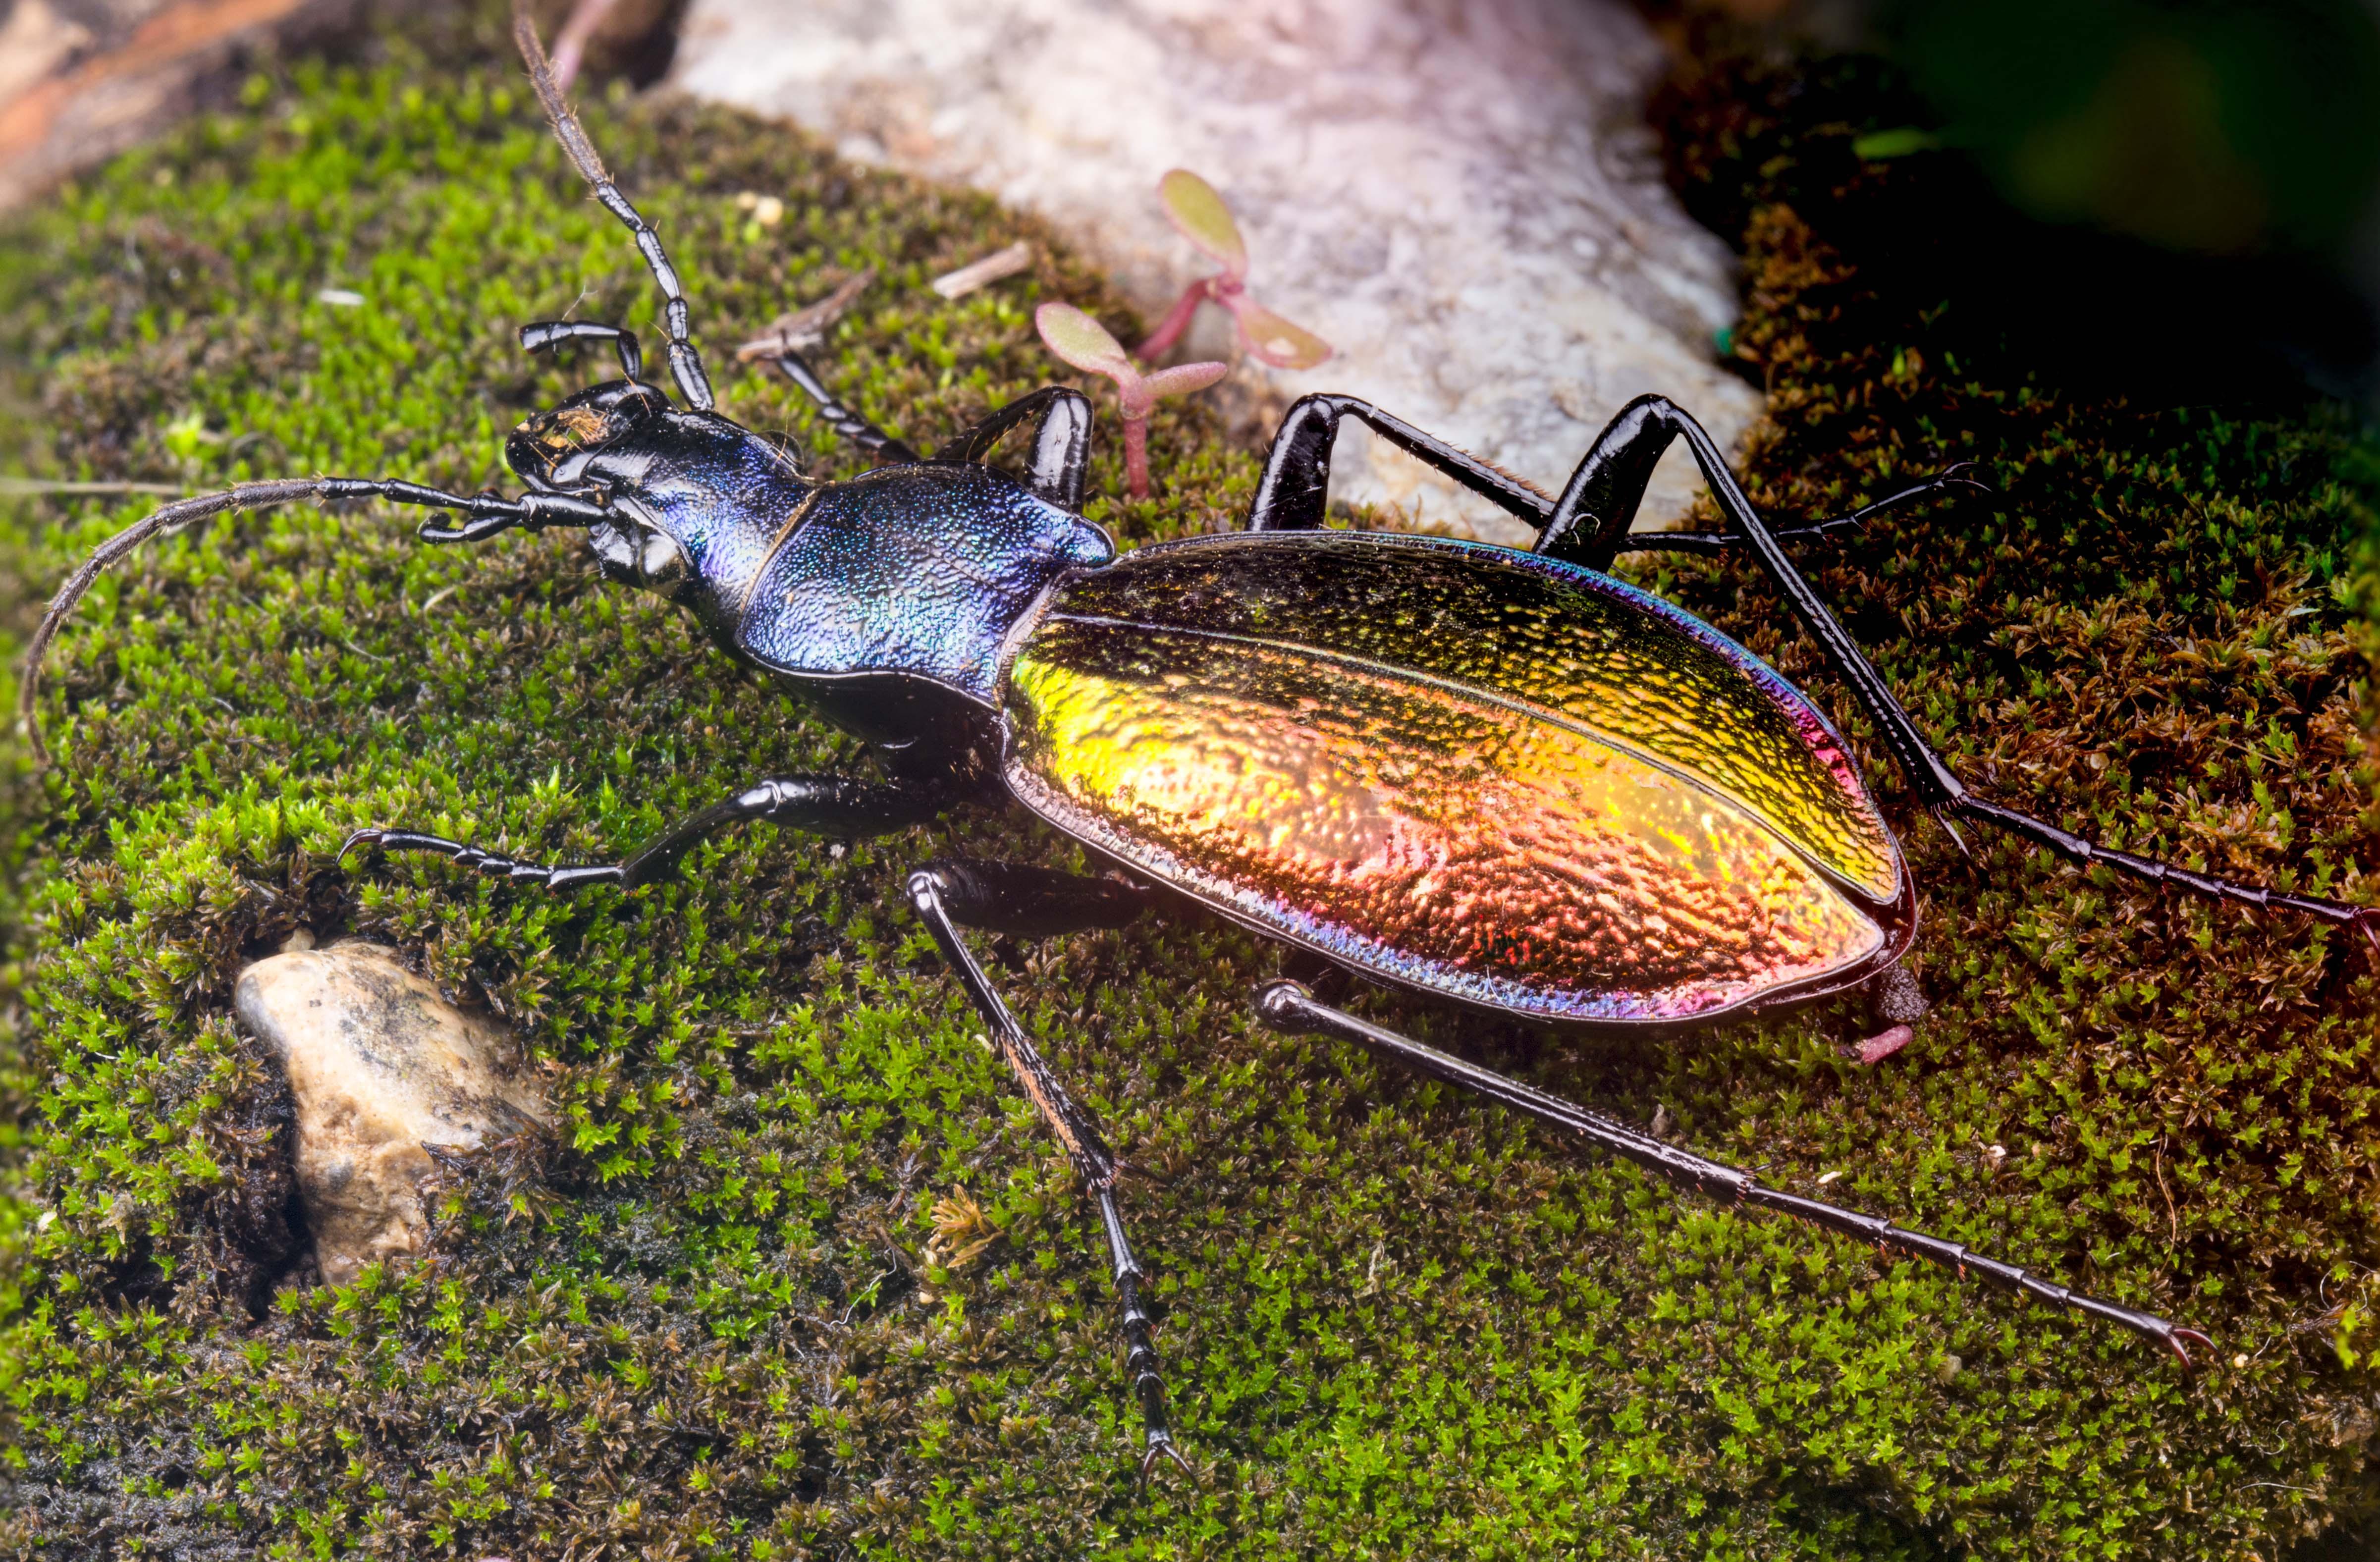 Carabus (chrysocarabus) hispanus